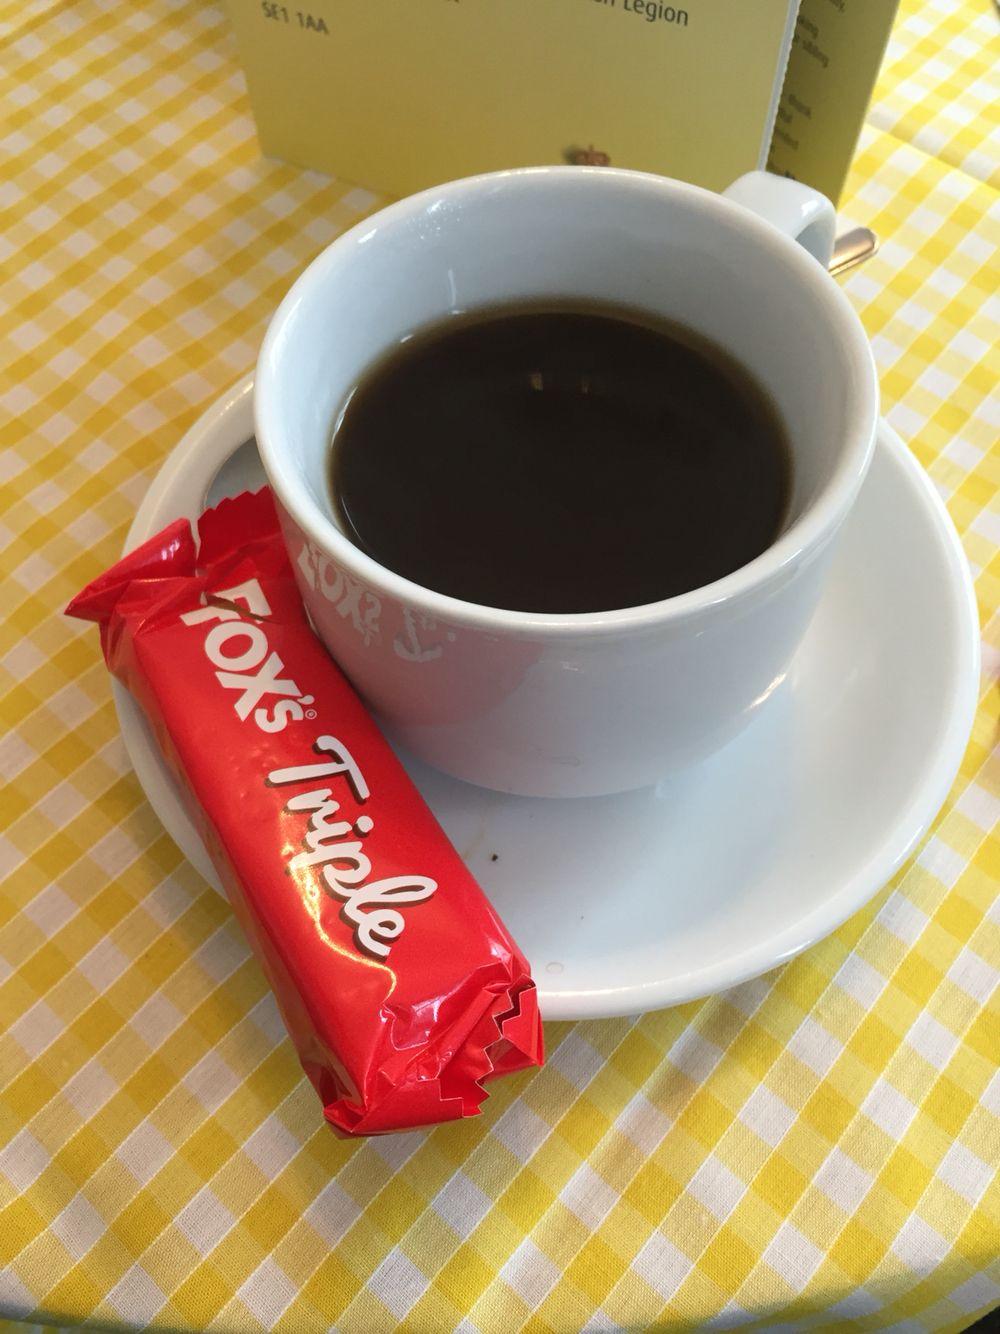 Fox's triple #coffeemorning